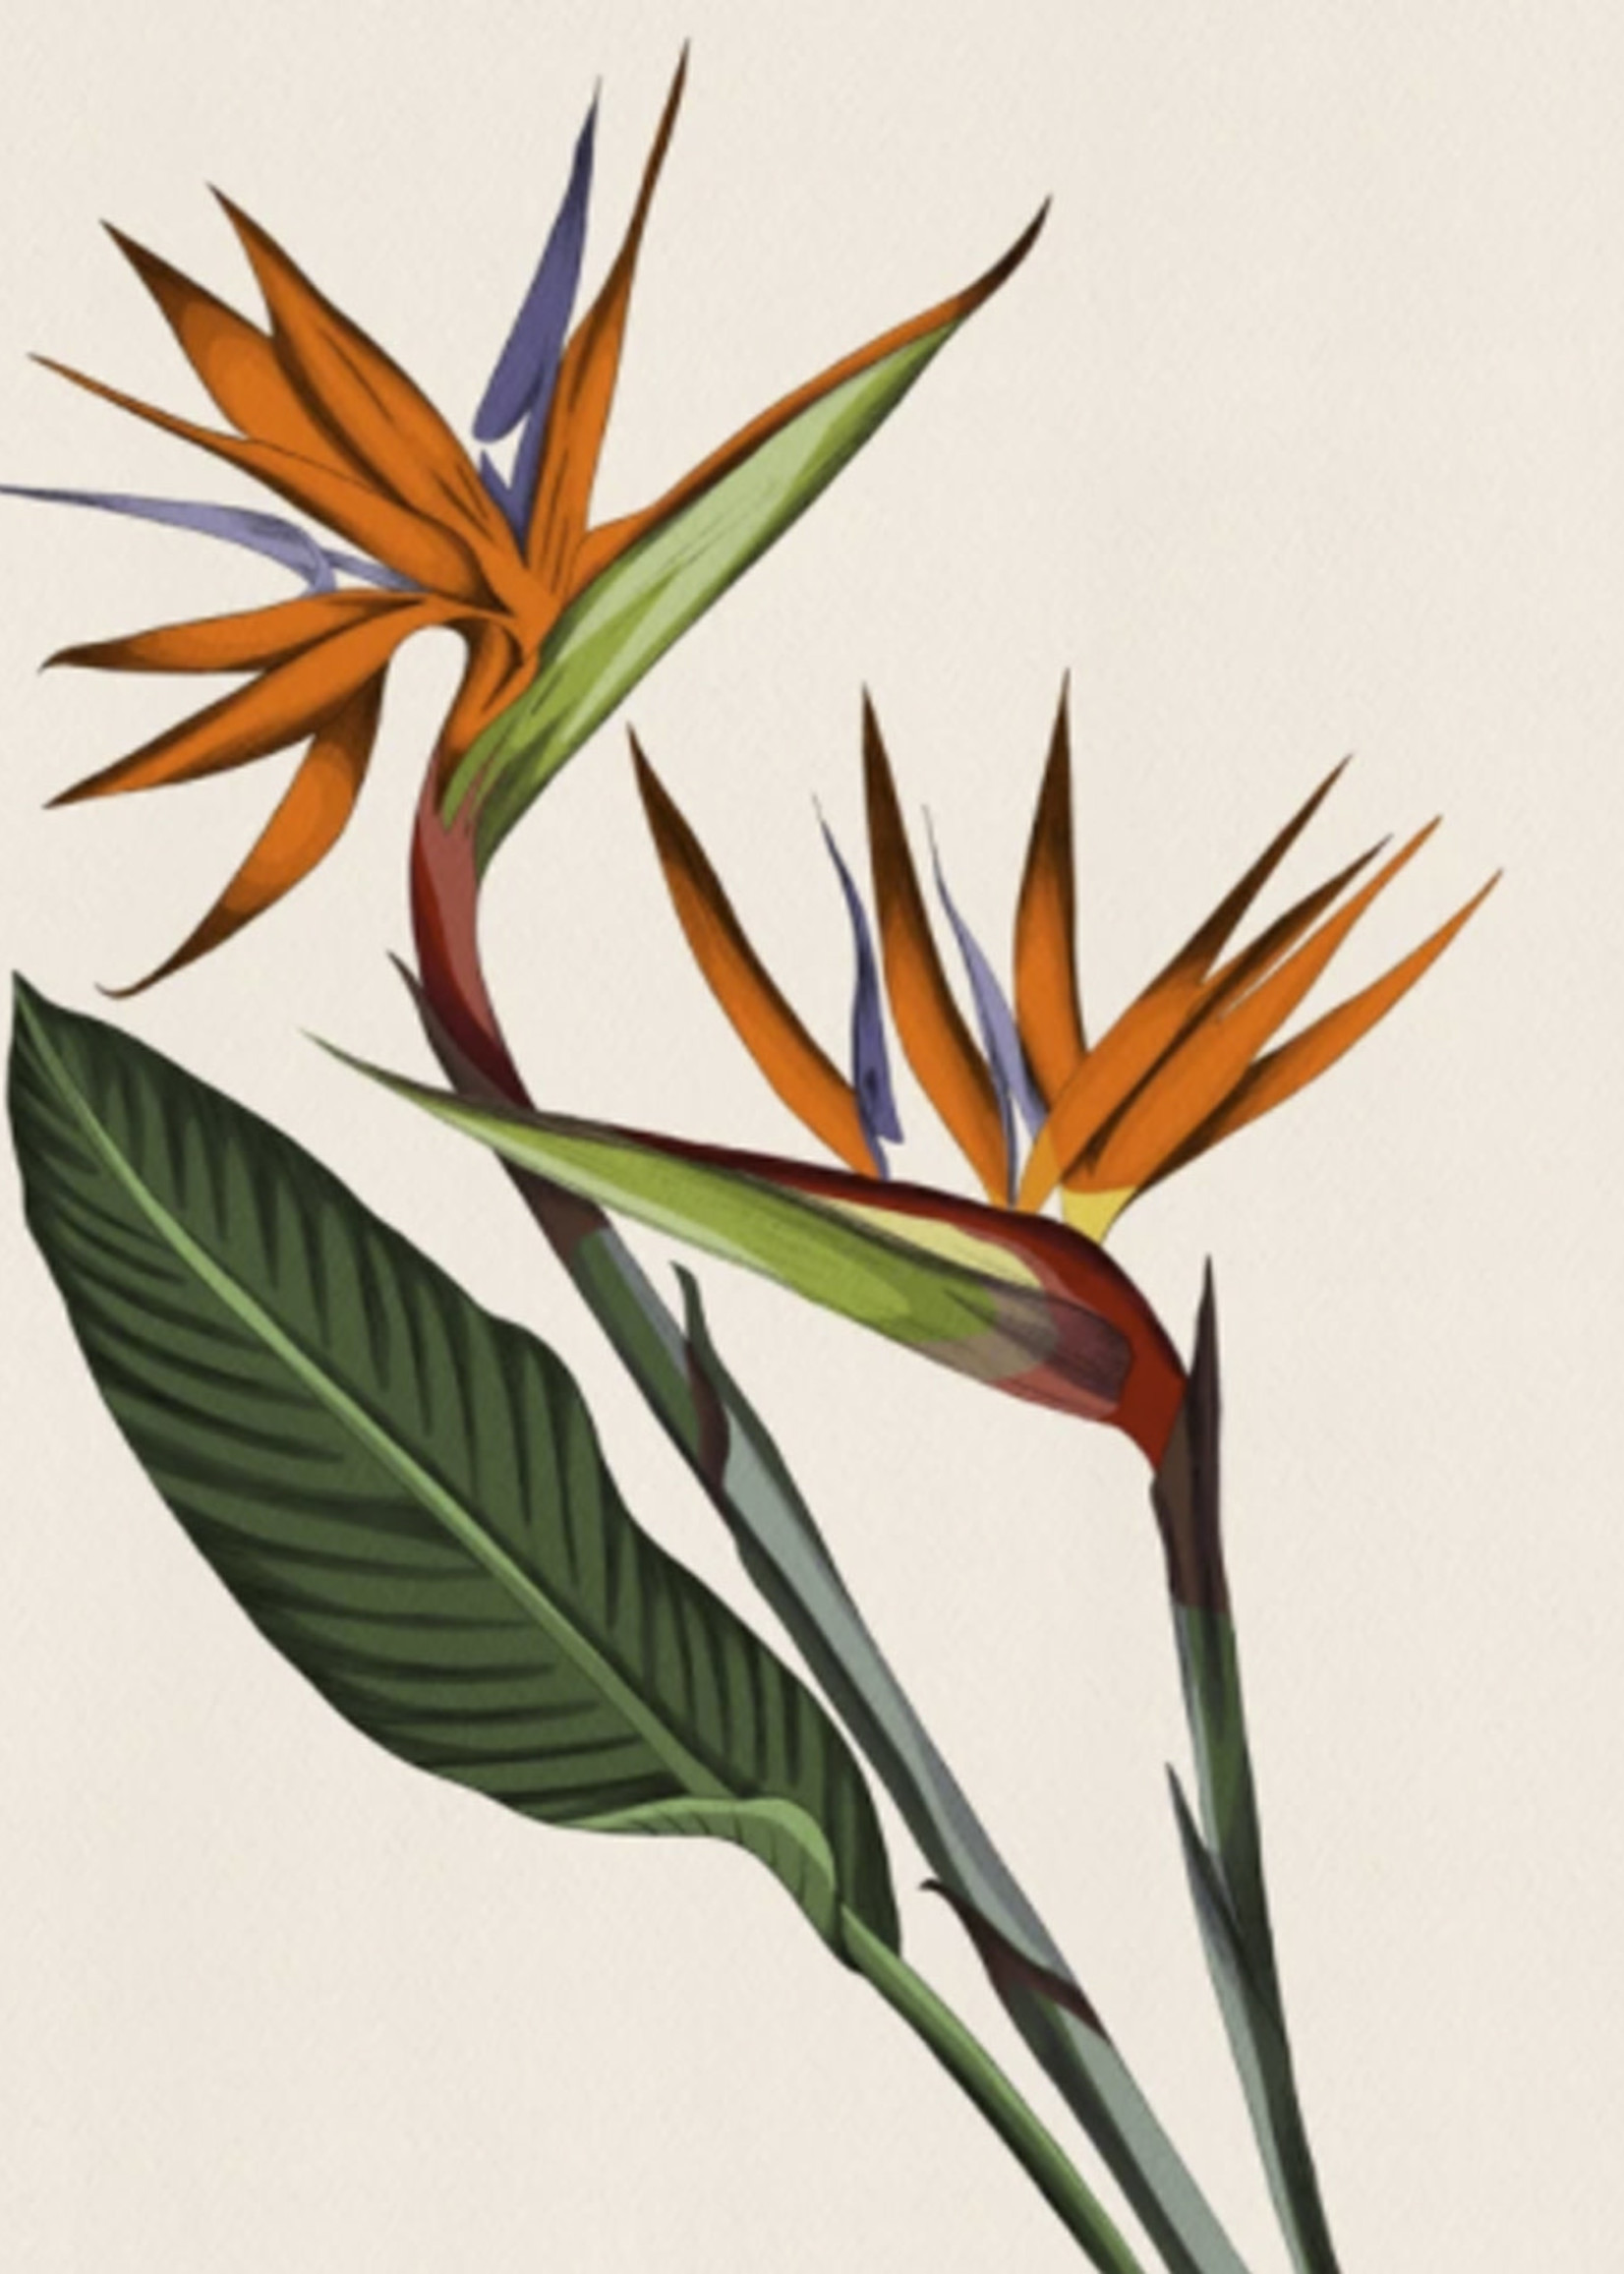 Mayan Llanera Illustrations MANU PELEKAIKO PRINT 8X10